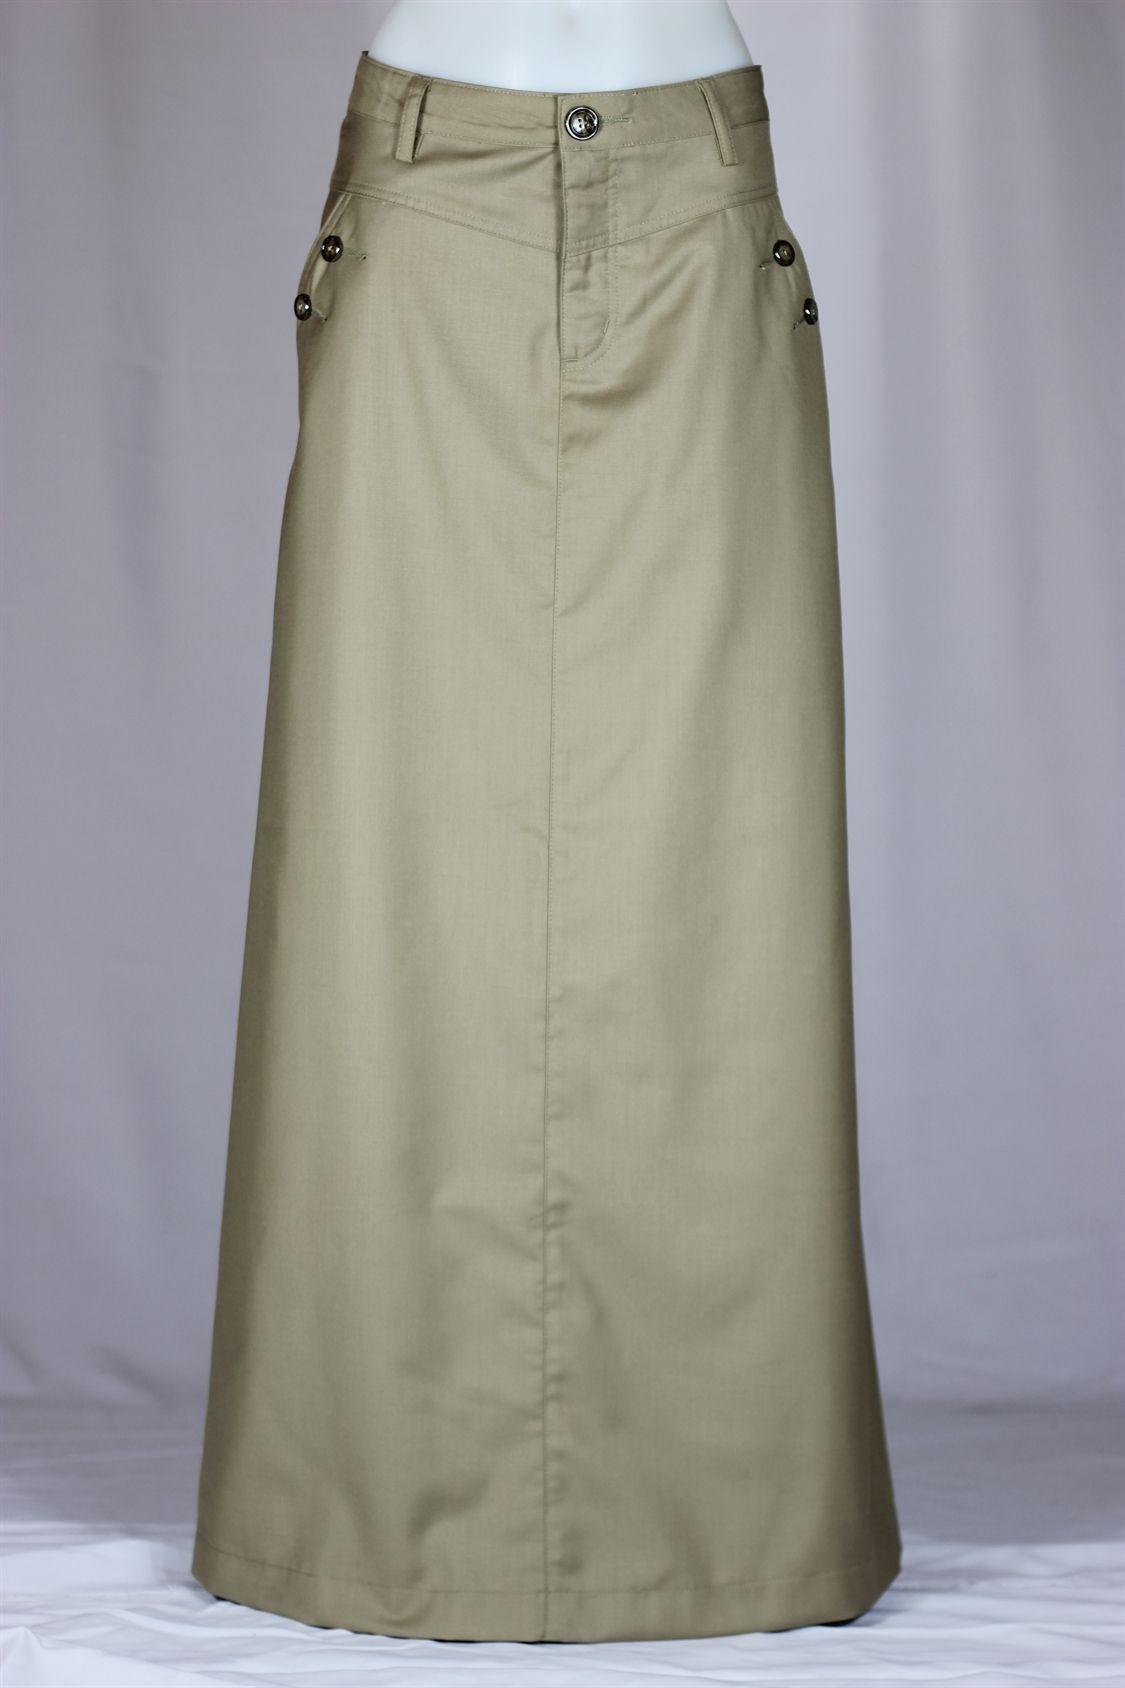 d7f3891333 Just Chic Long Khaki Skirt, Sizes 6-18 | If I Had Style | Long khaki ...